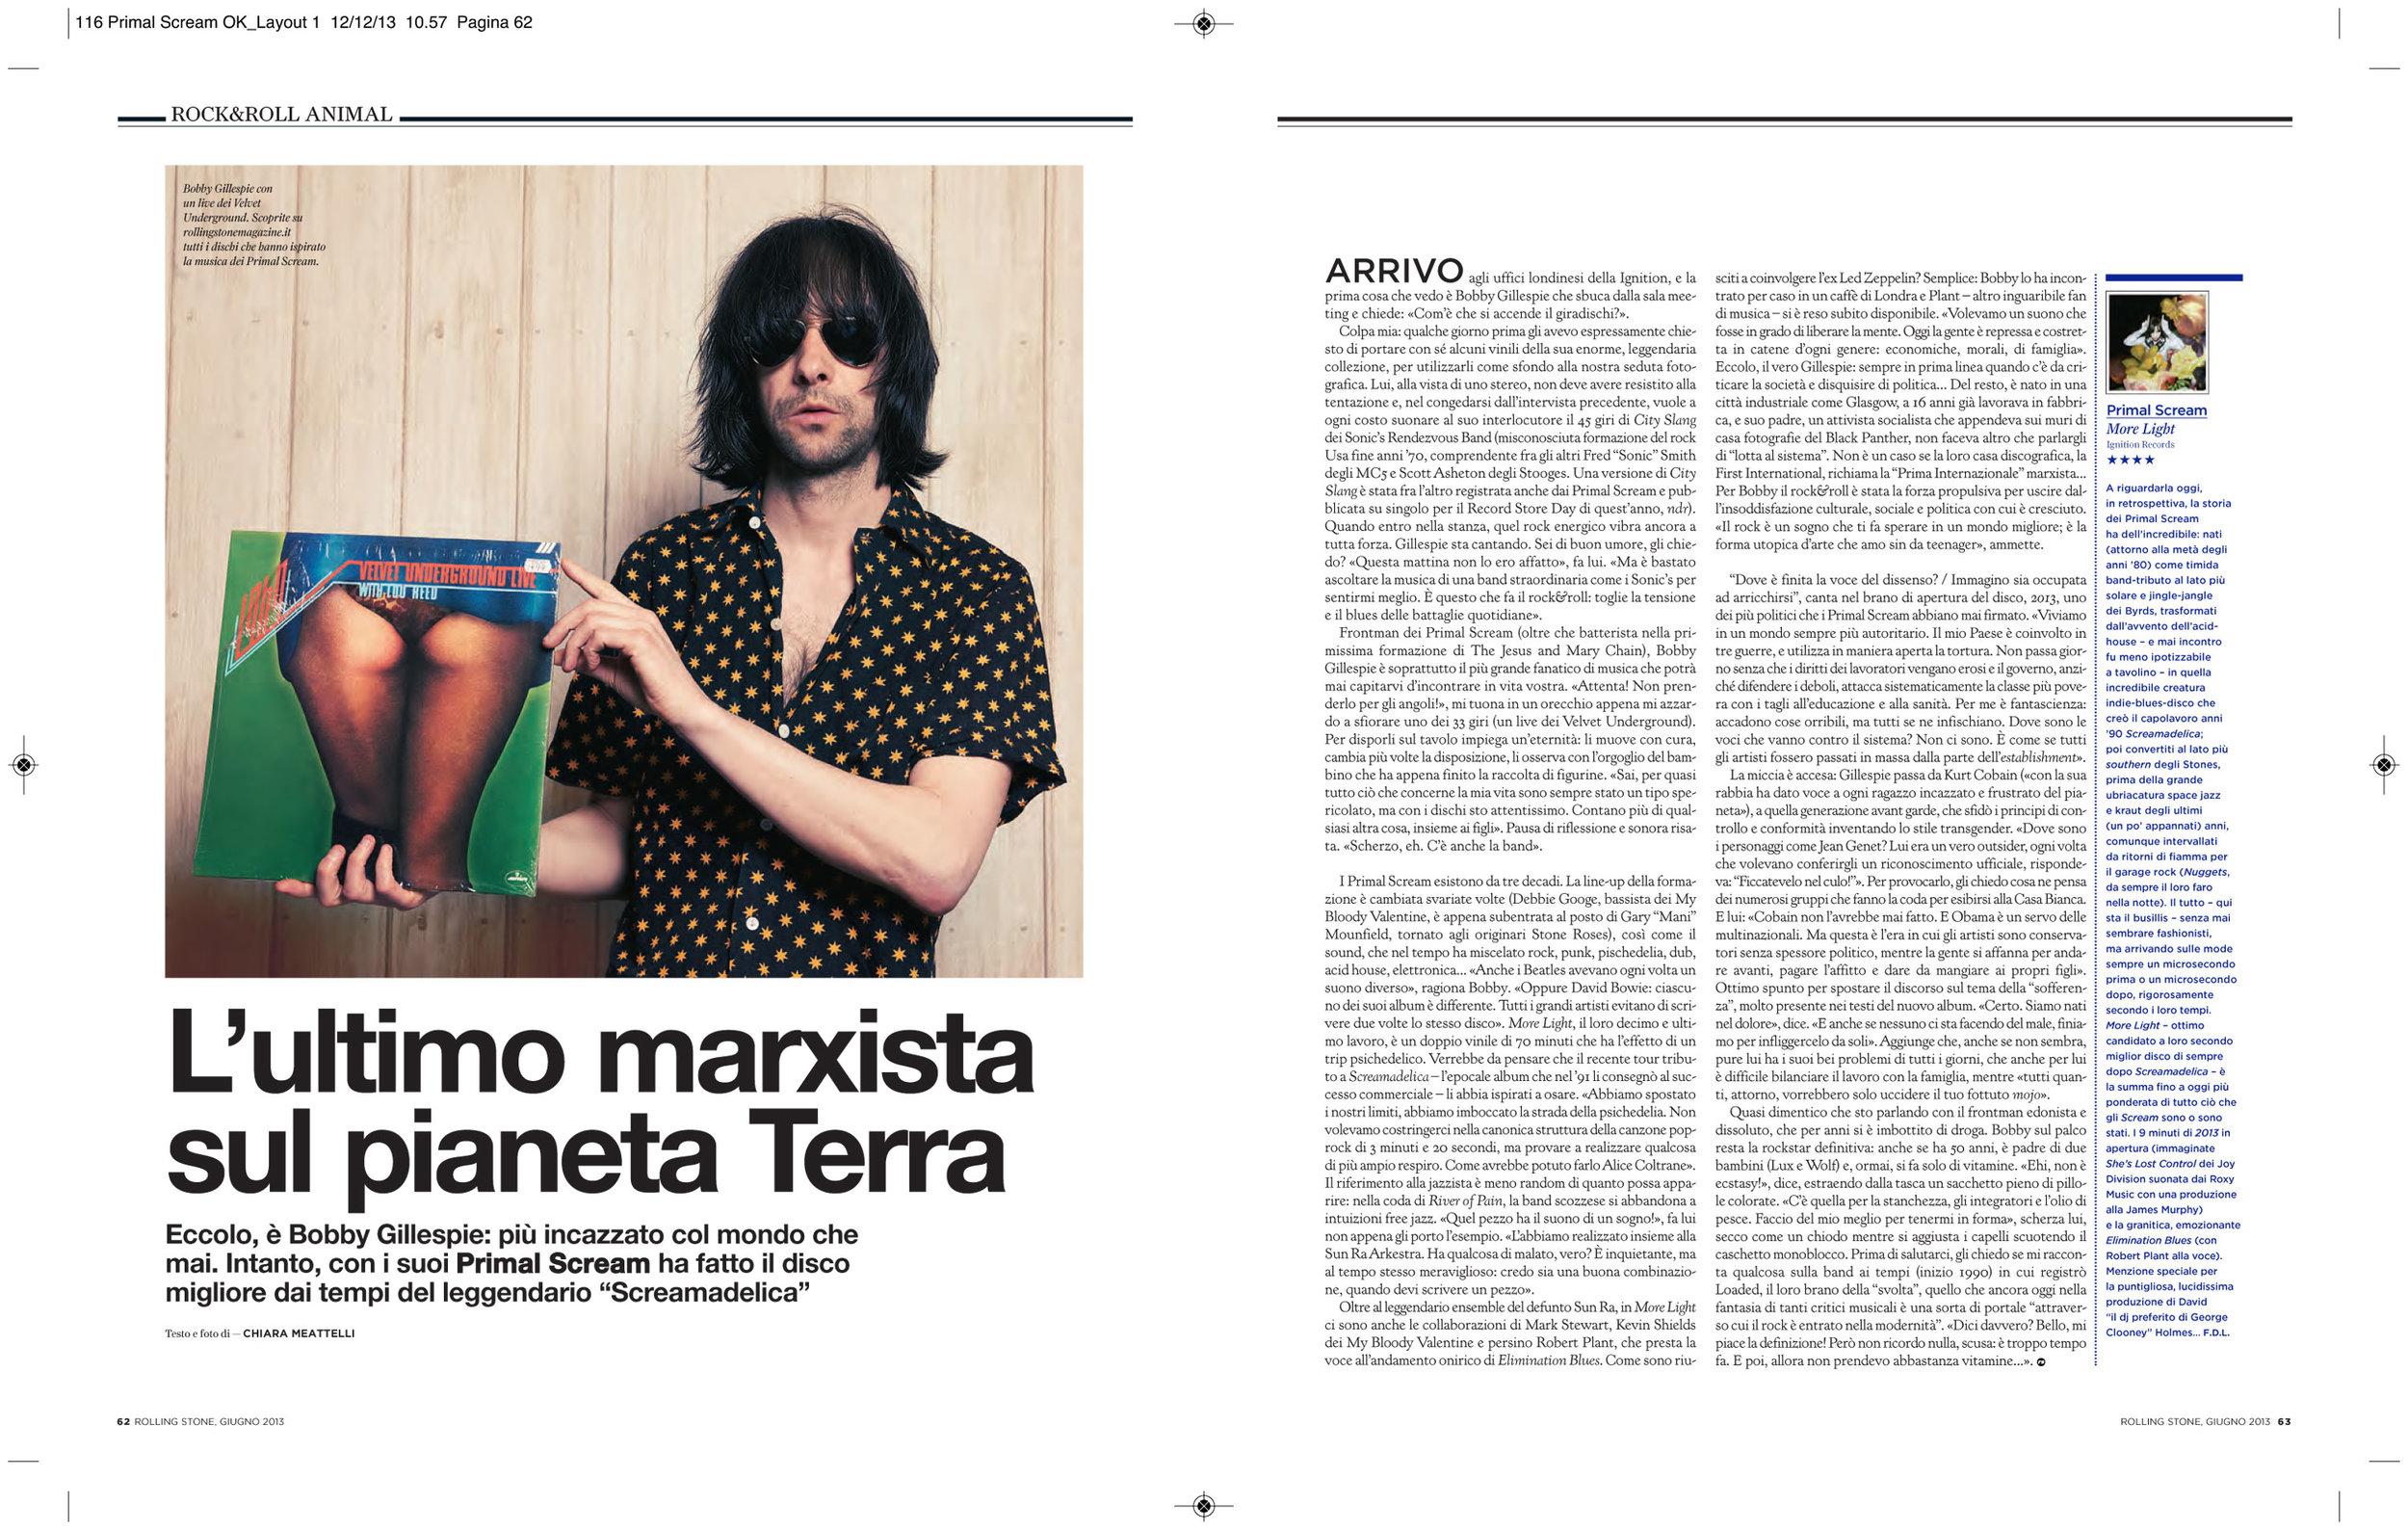 Rolling Stone magazine: Primal Scream interview & photo